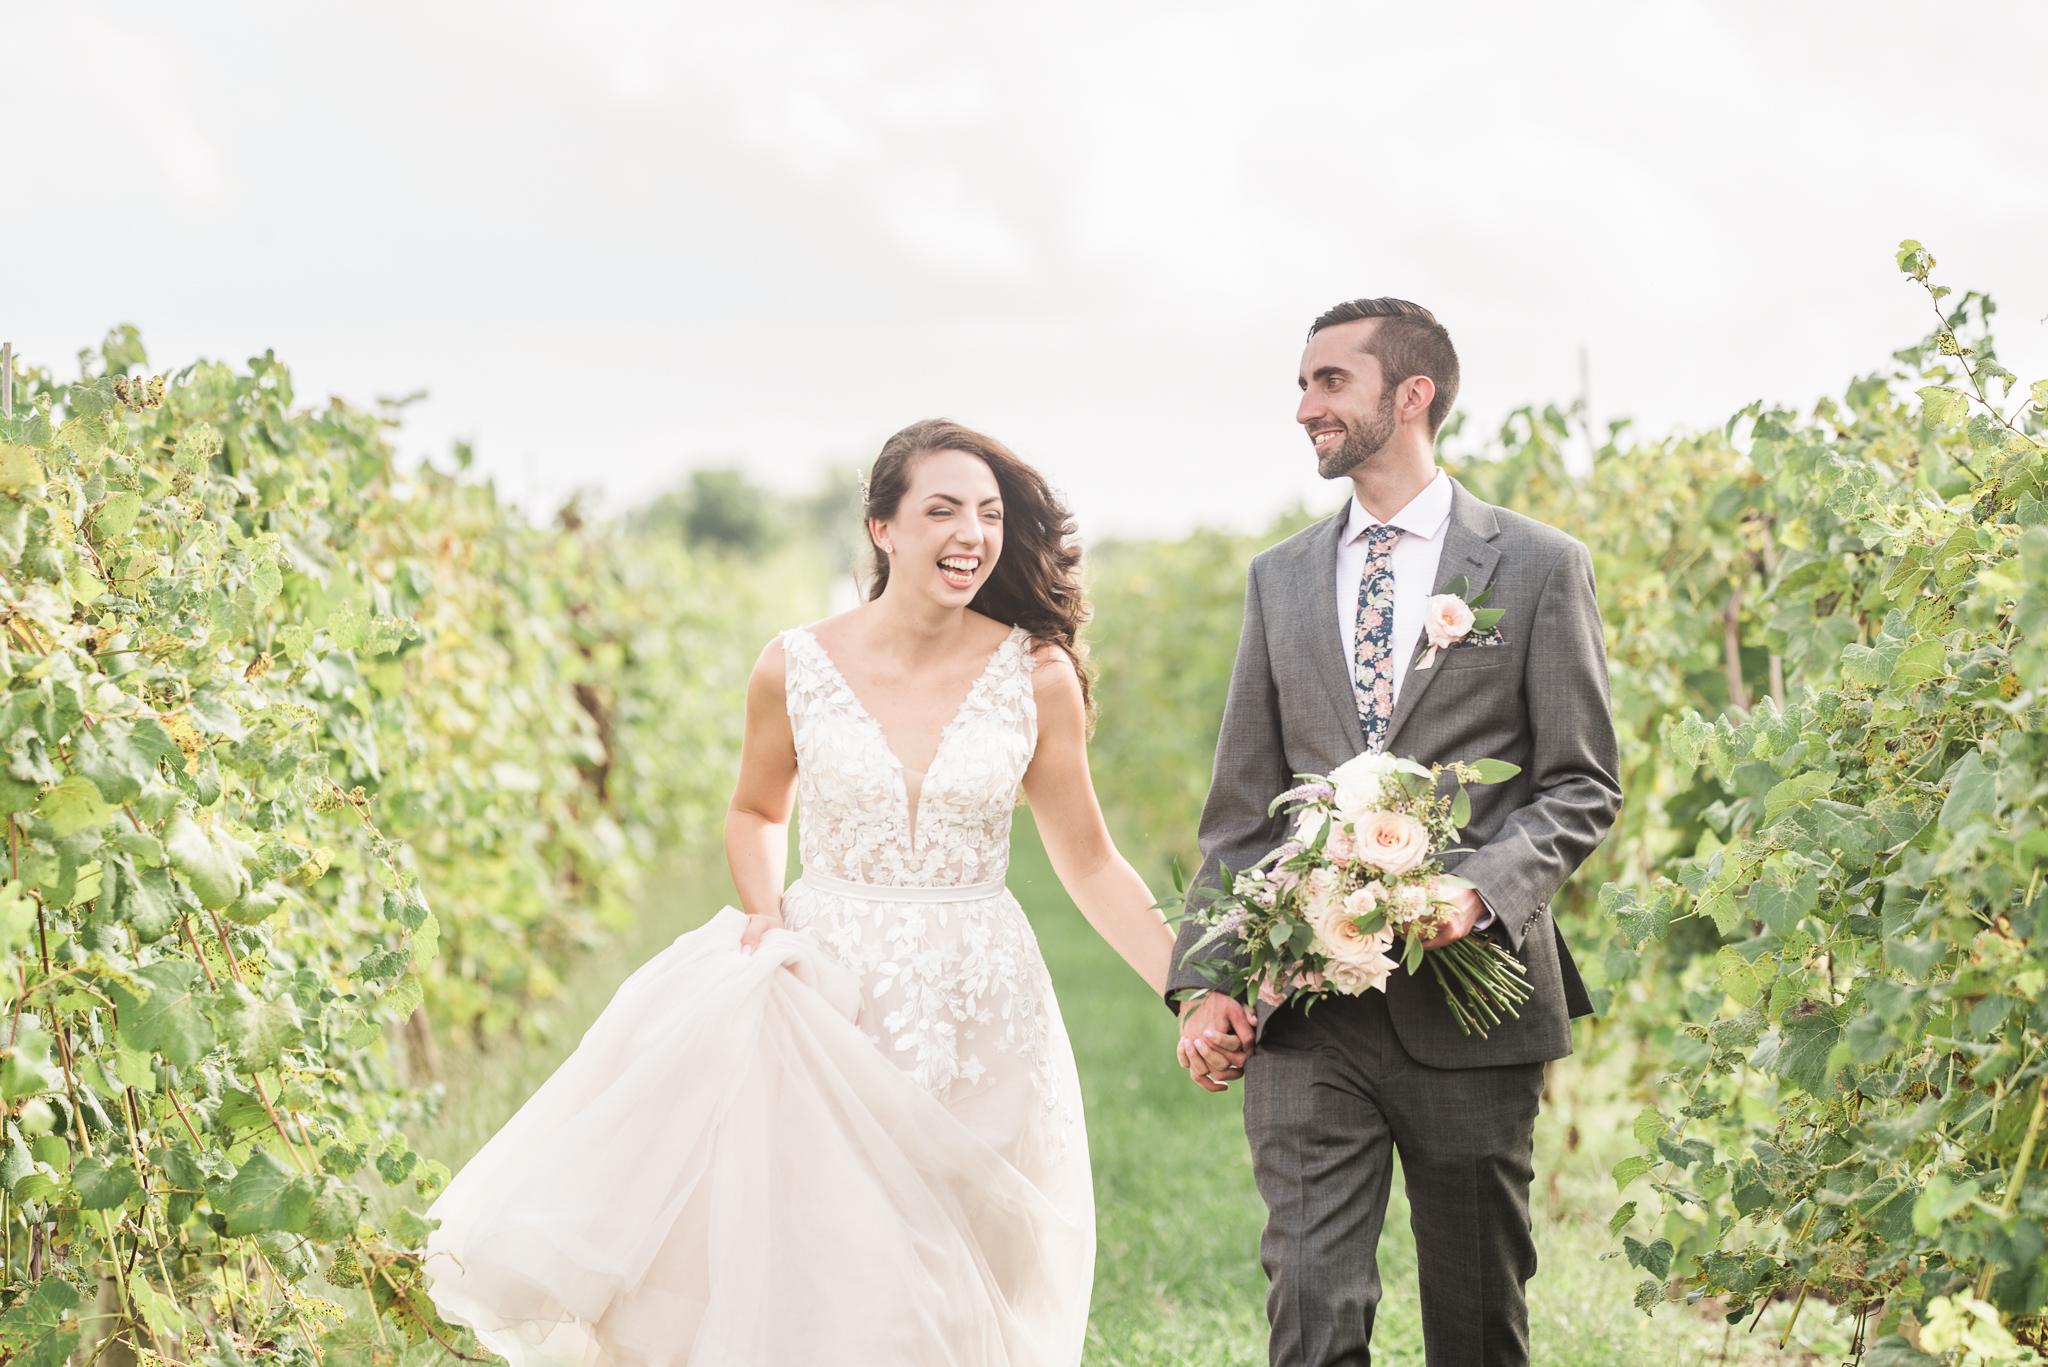 Sycamore at Mallow Run Wedding7188.jpg